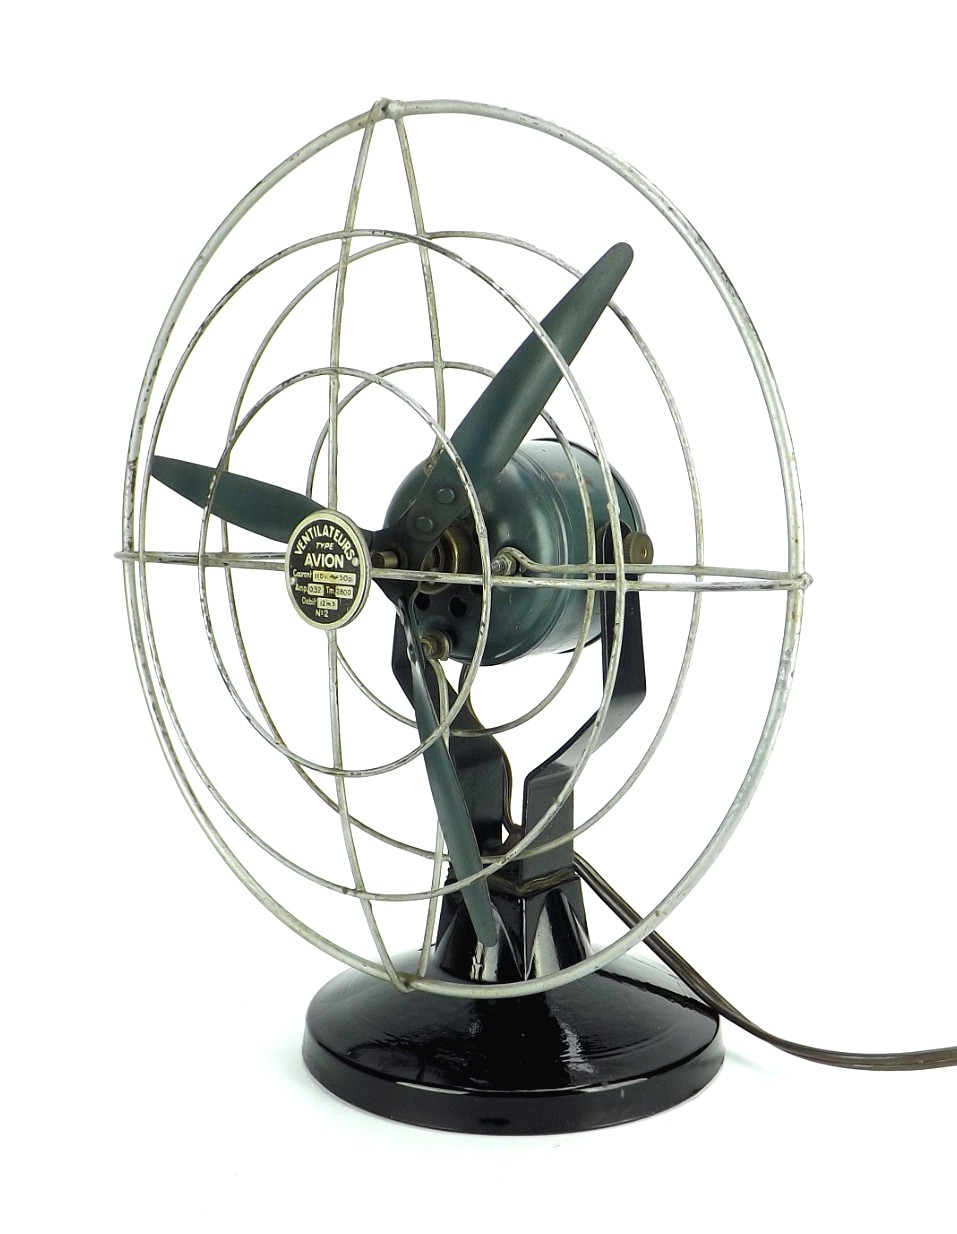 "Circa 1930's Avion Ventilateur  Made In France 8"" Desk Fan"